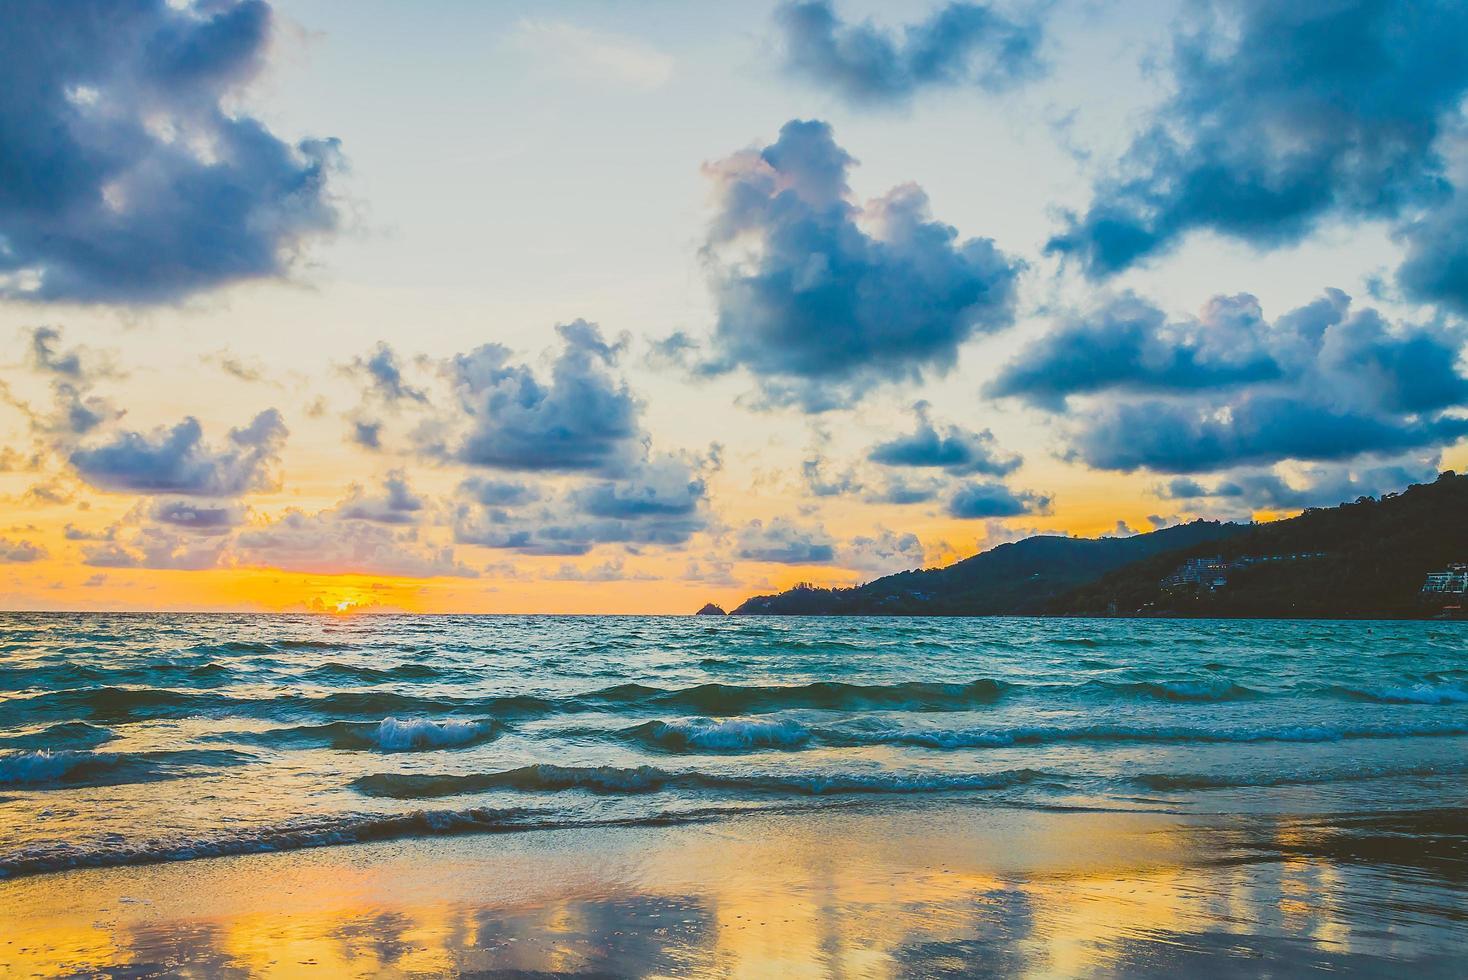 Sonnenuntergang am Strand foto